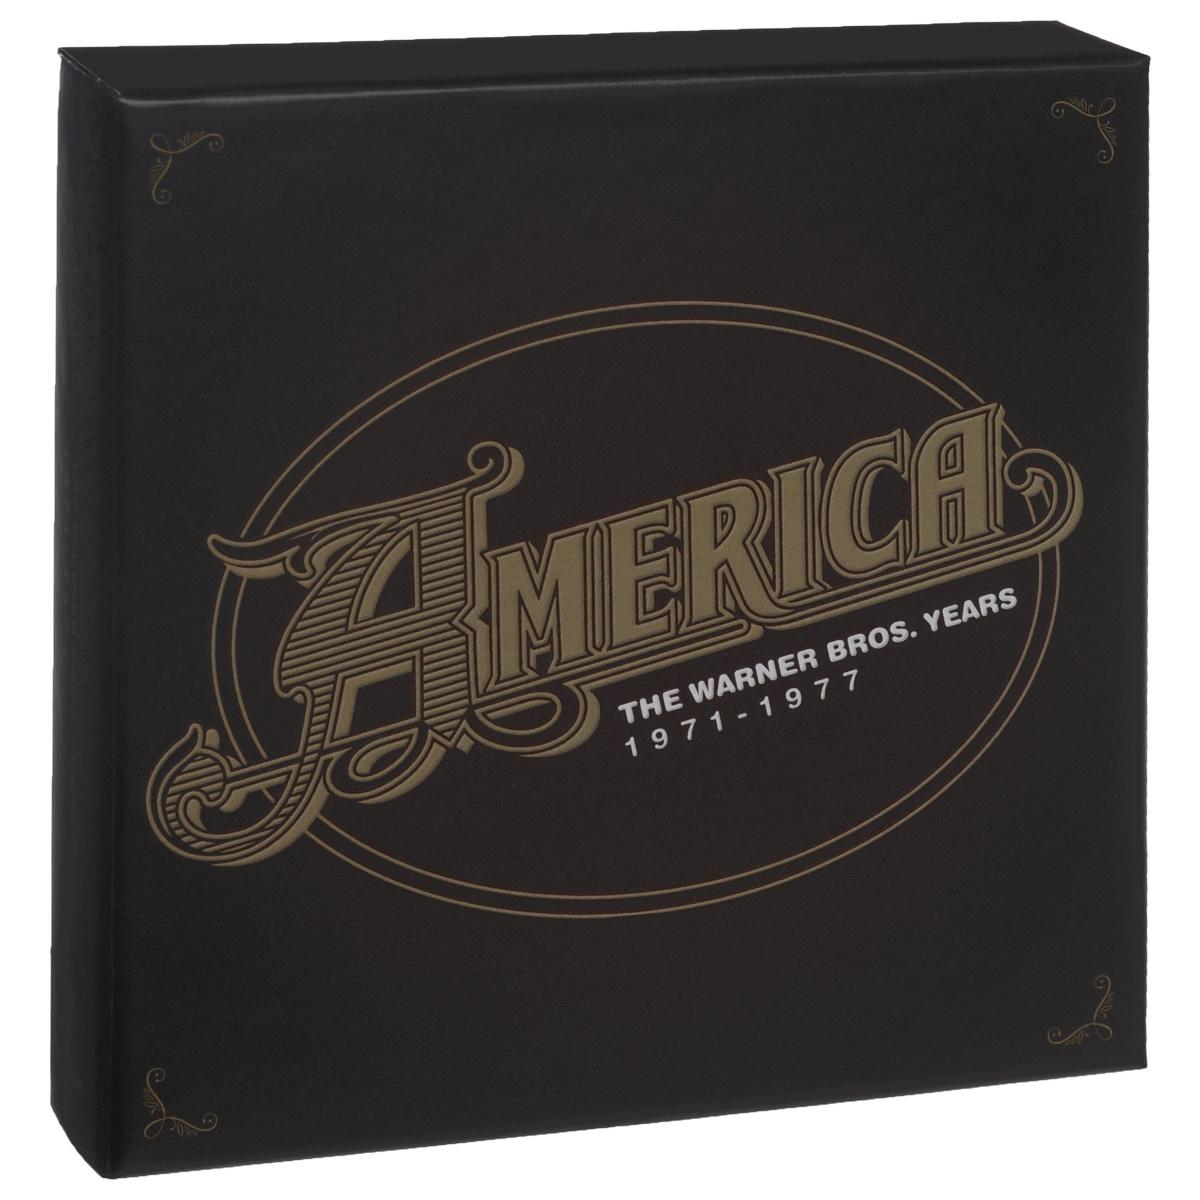 America America. The Warner Bros. Years 1971-1977 (8 CD) накладной хвост the bai america place